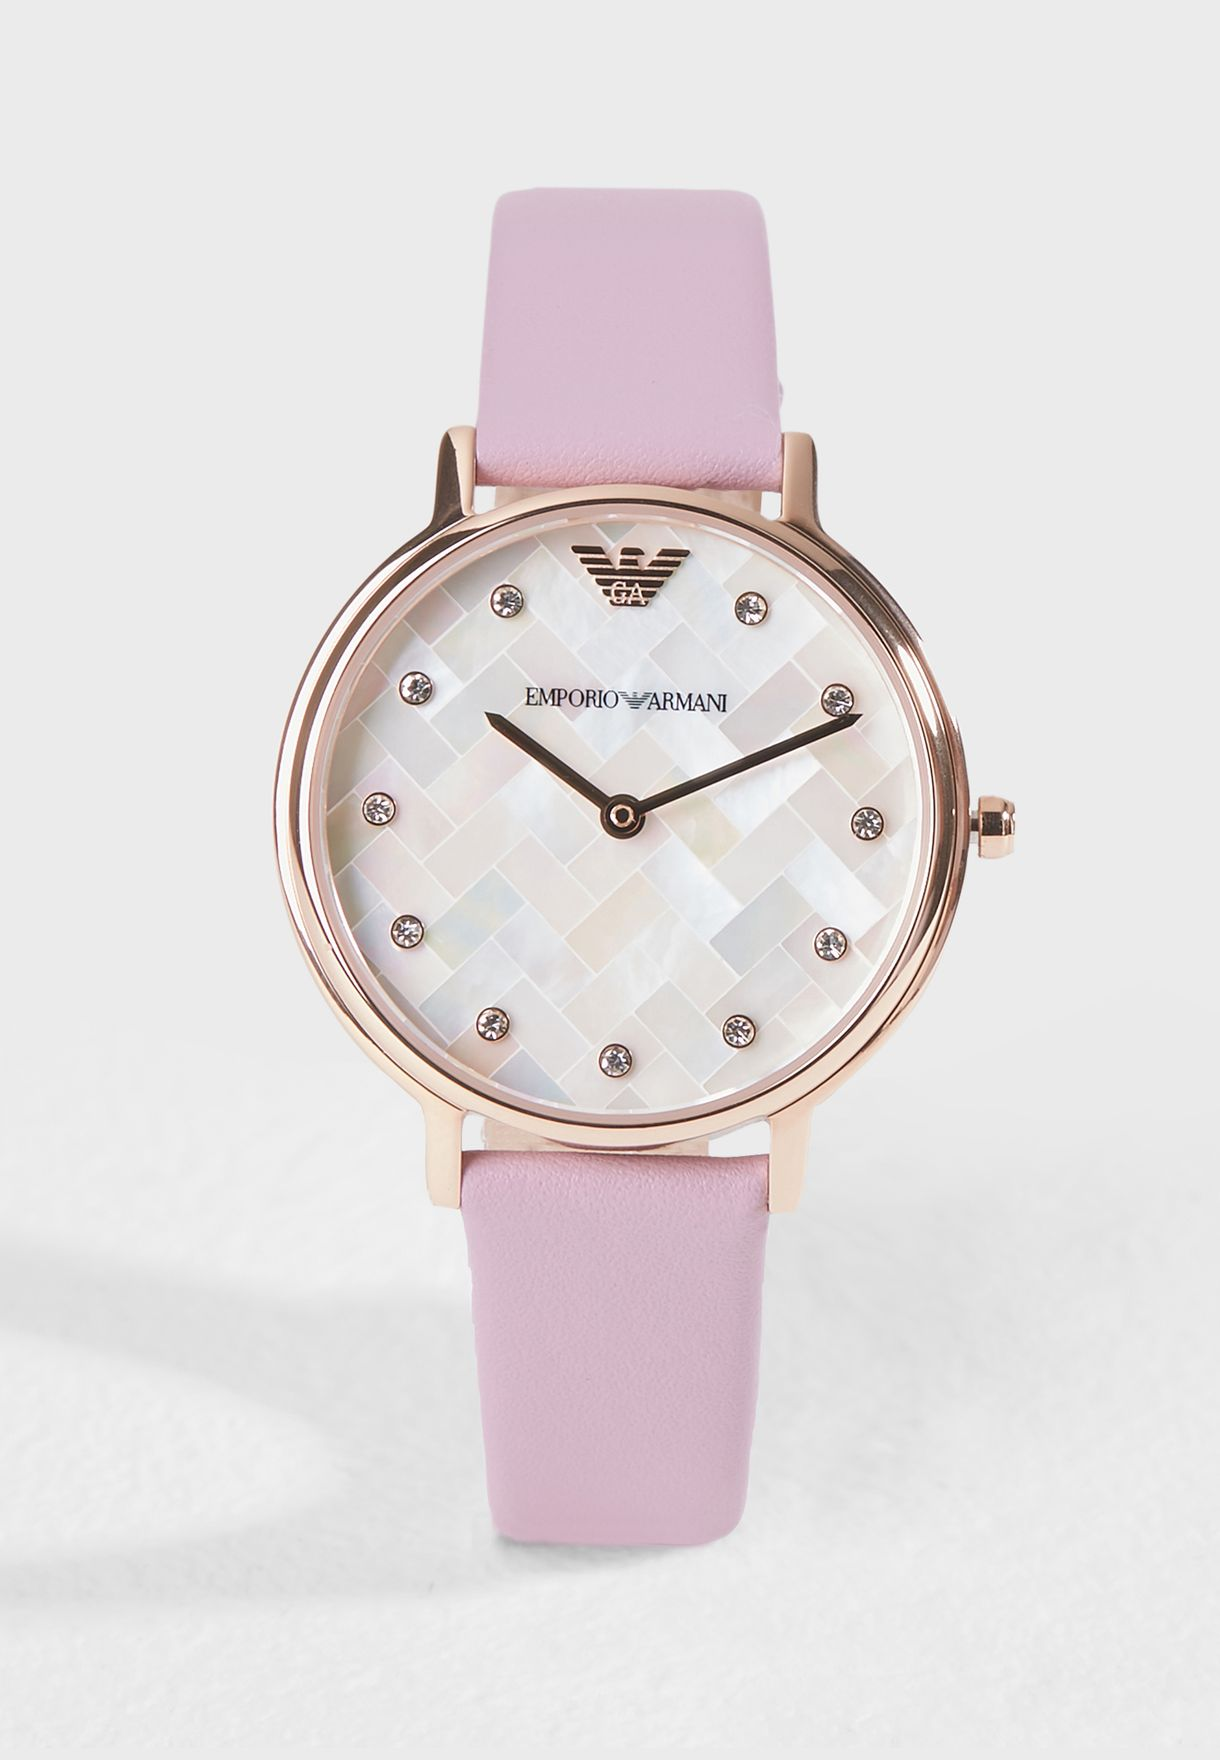 bec28221c تسوق ساعة جلد اصلي ماركة امبريو ارماني لون وردي AR11130 في قطر ...